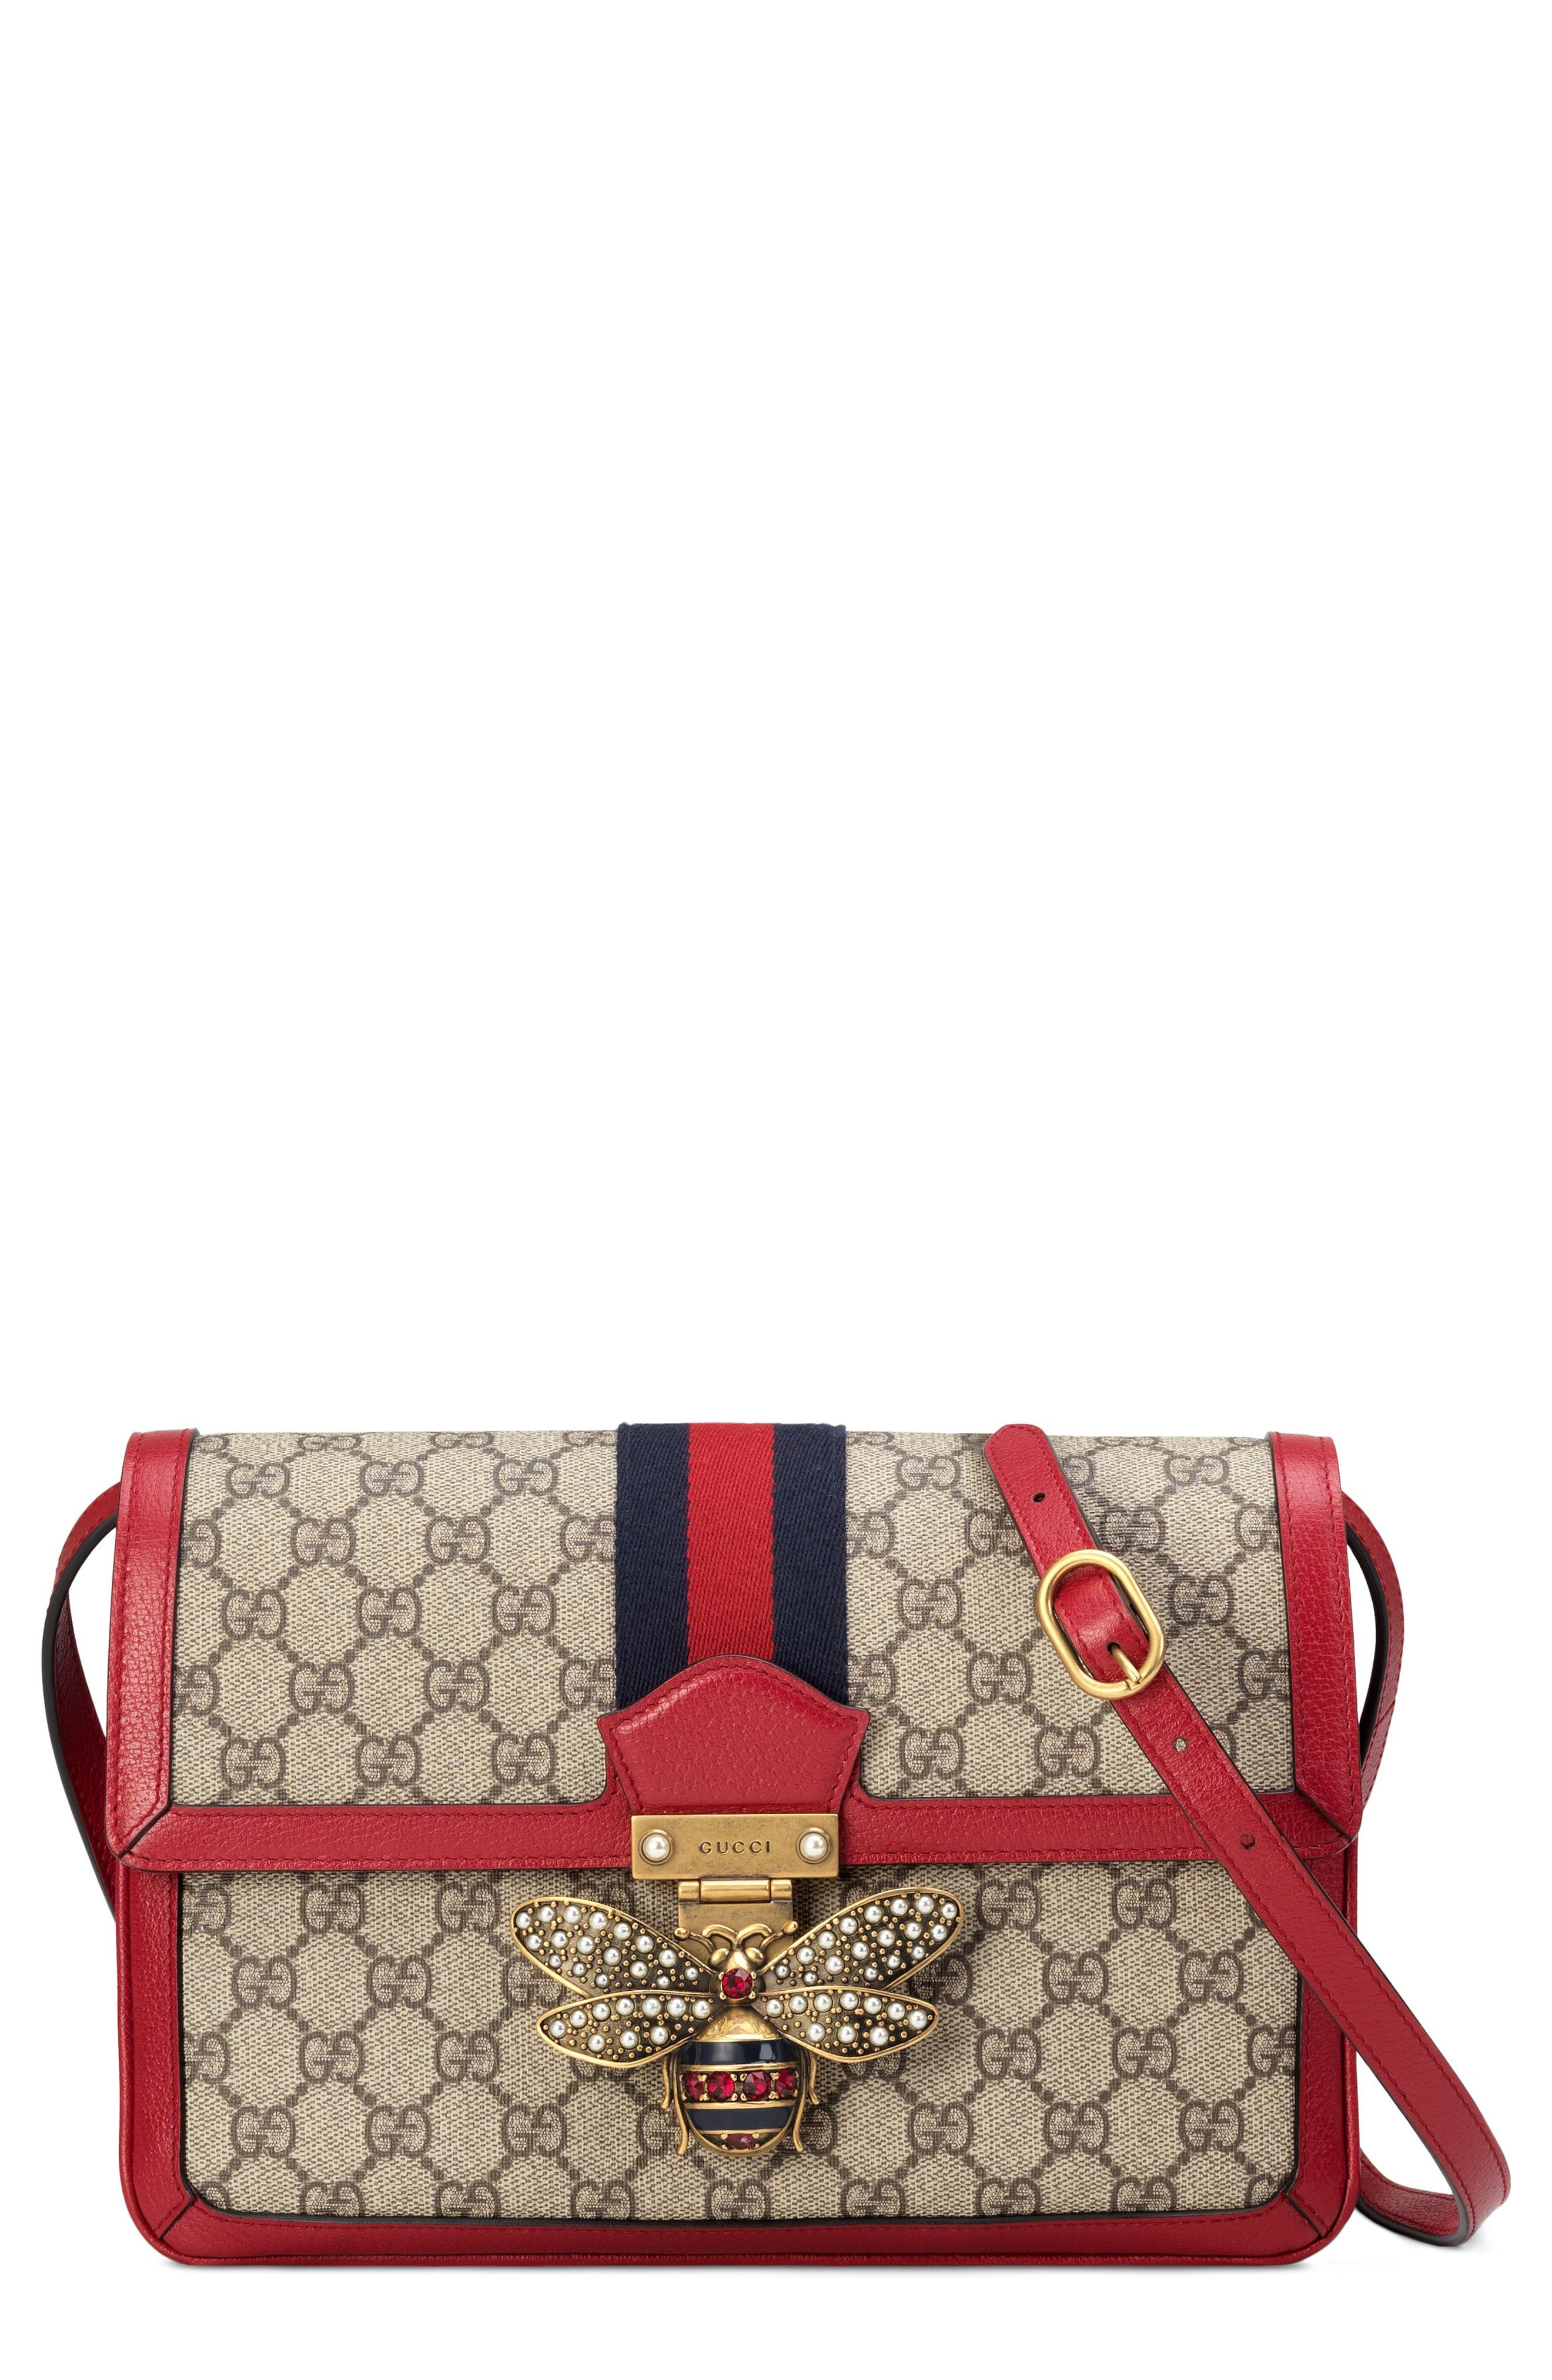 Gucci Queen Margaret GG Supreme Small Crossbody Bag